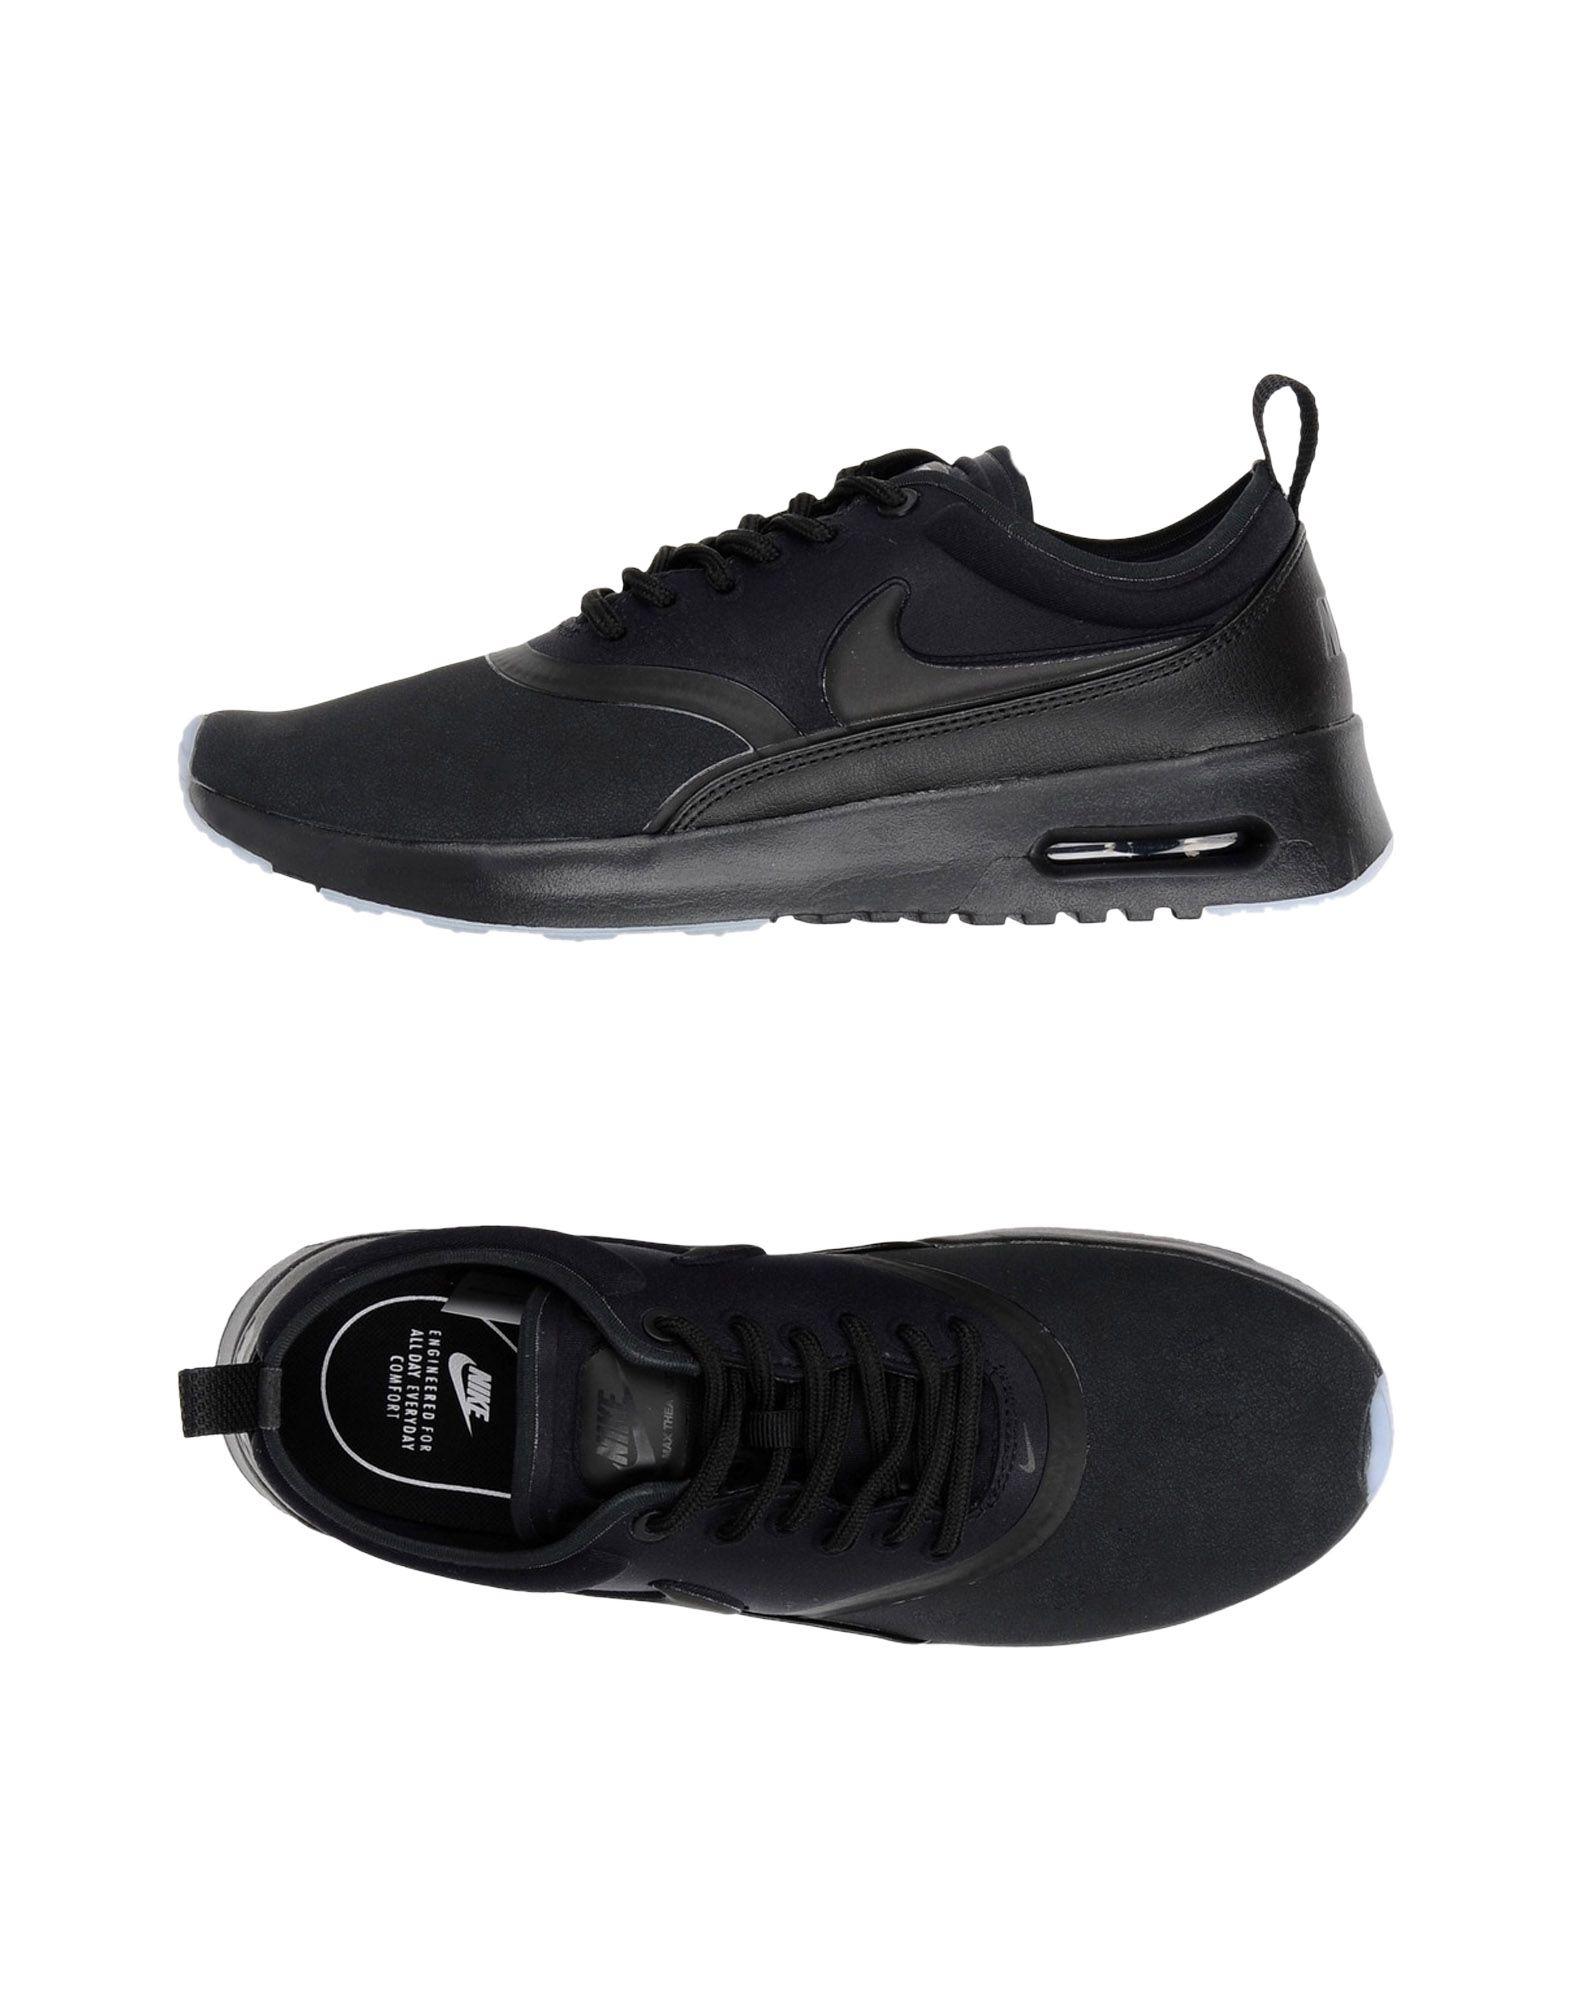 Scarpe Thea da Ginnastica Nike Nike Thea Scarpe - Donna - 11373812LW a6fd20